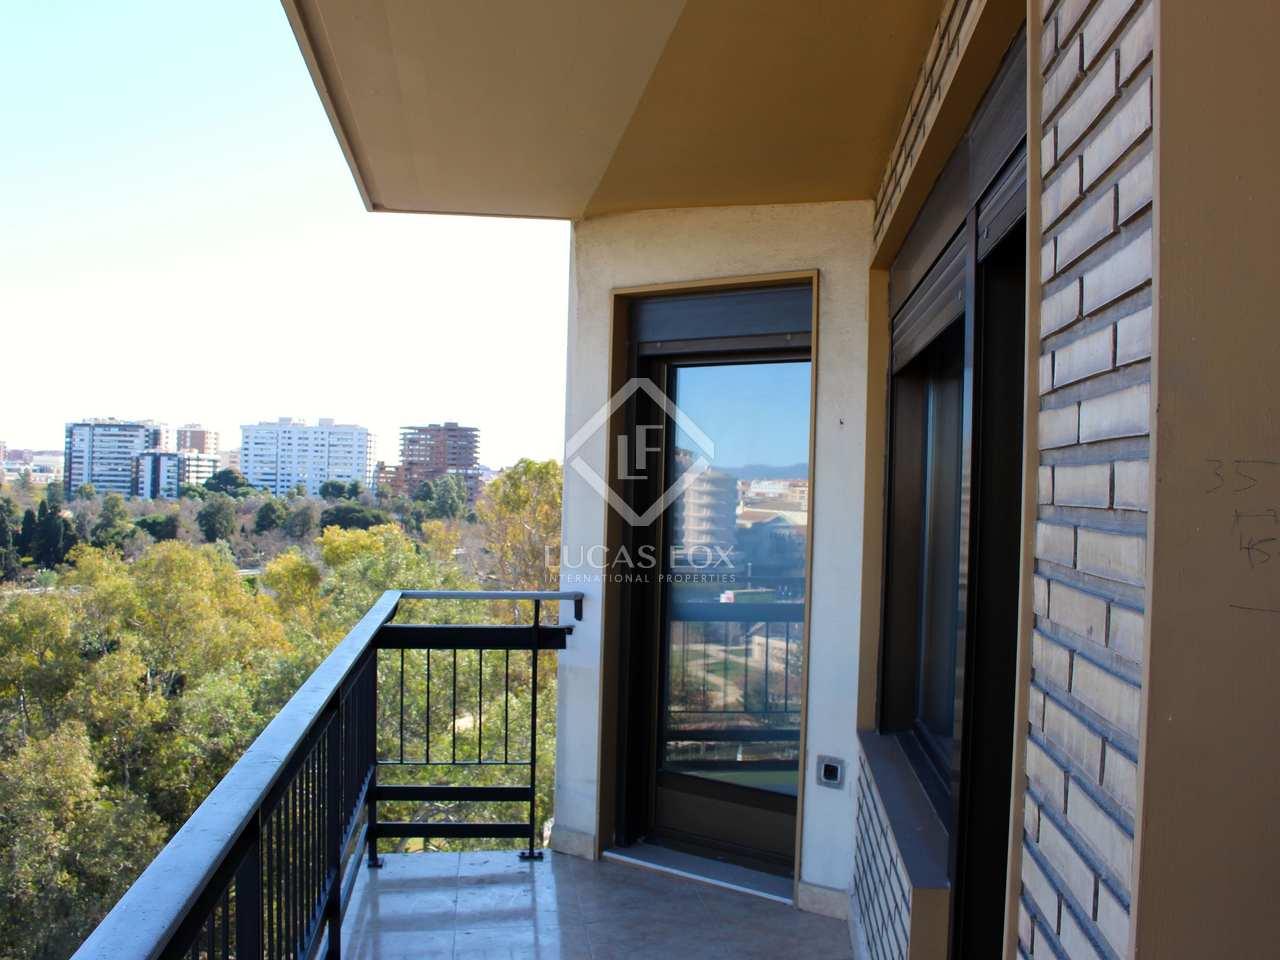 Piso de 78m con terraza de 8m en alquiler en la seu for Alquiler piso terraza valencia